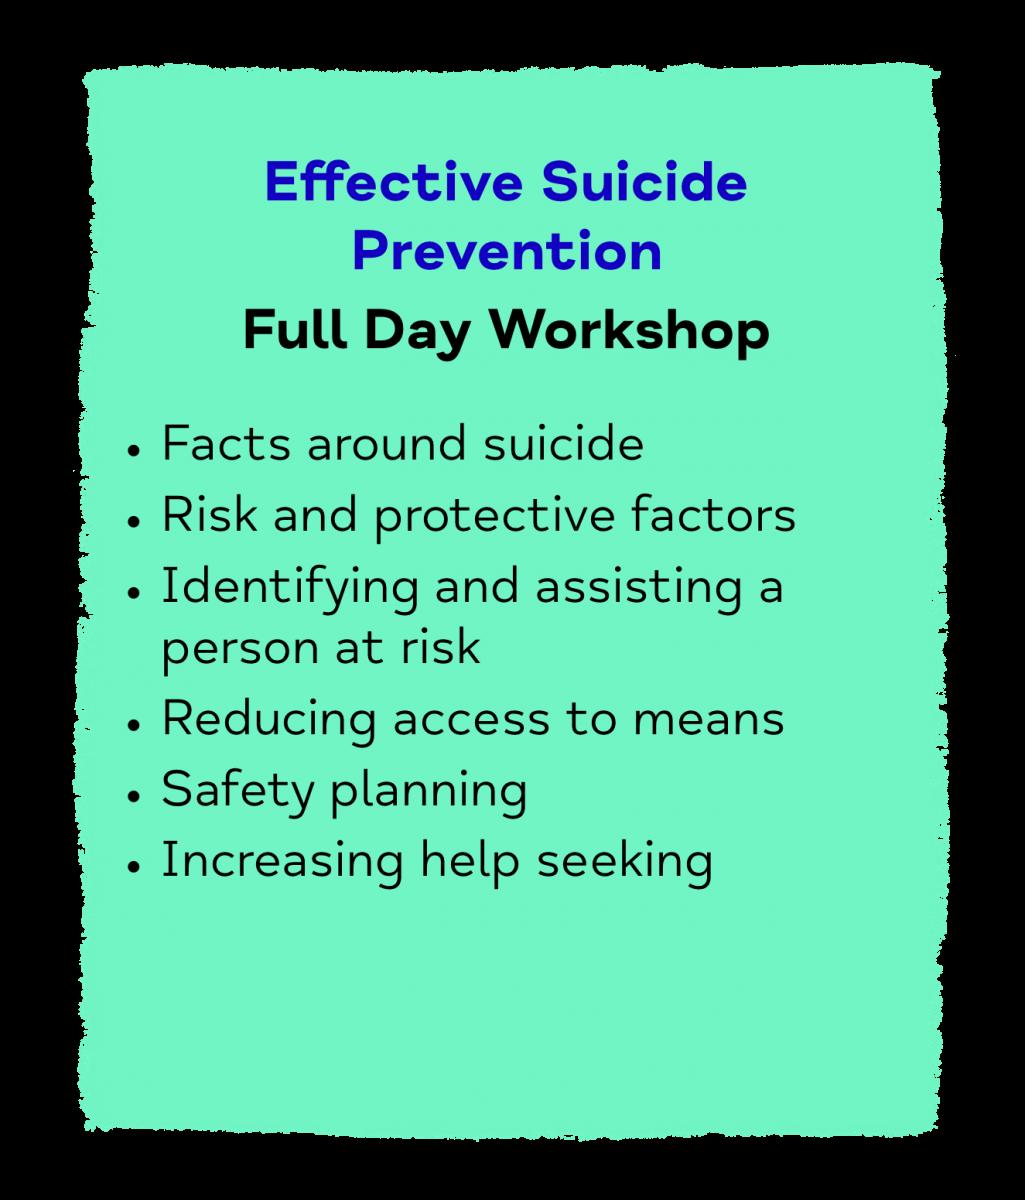 Effective Suicide Prevention Full Day Workshop